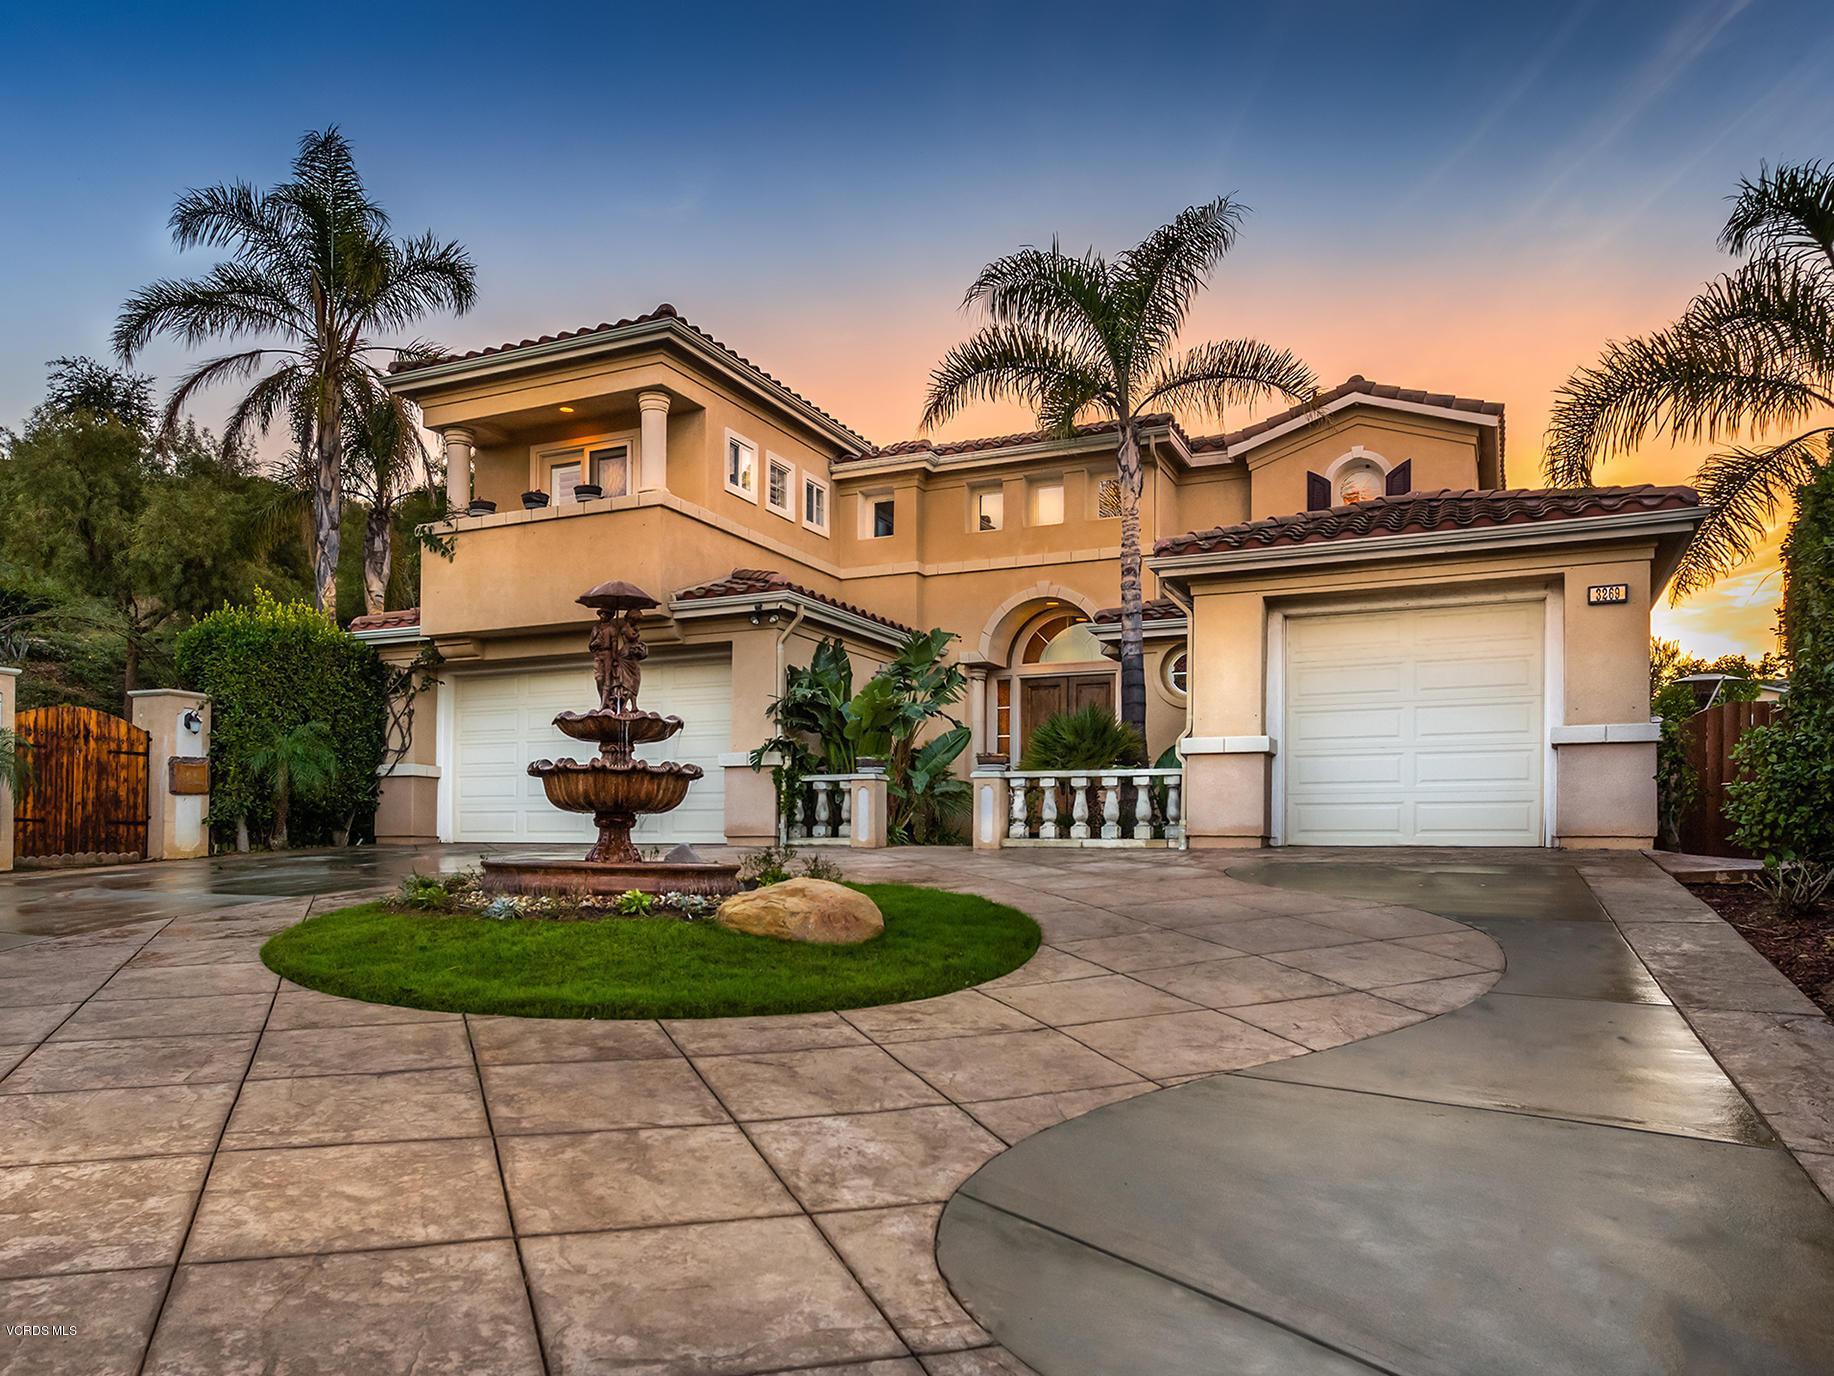 3269 Morning Ridge Avenue, Thousand Oaks, CA 91362